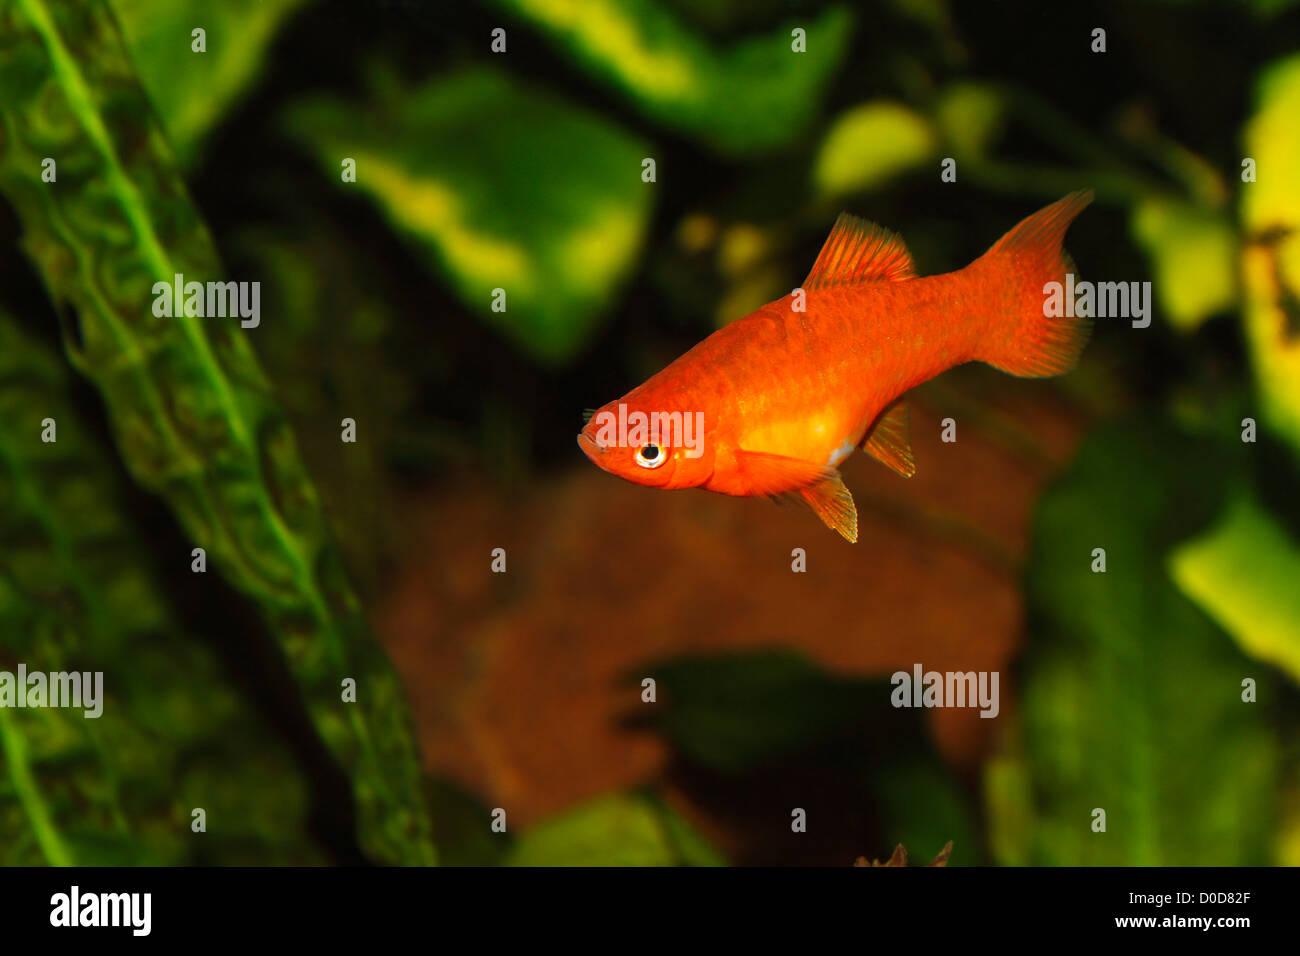 Swordtail (Xiphophorus hellerii) - female in a fish tank Stock Photo